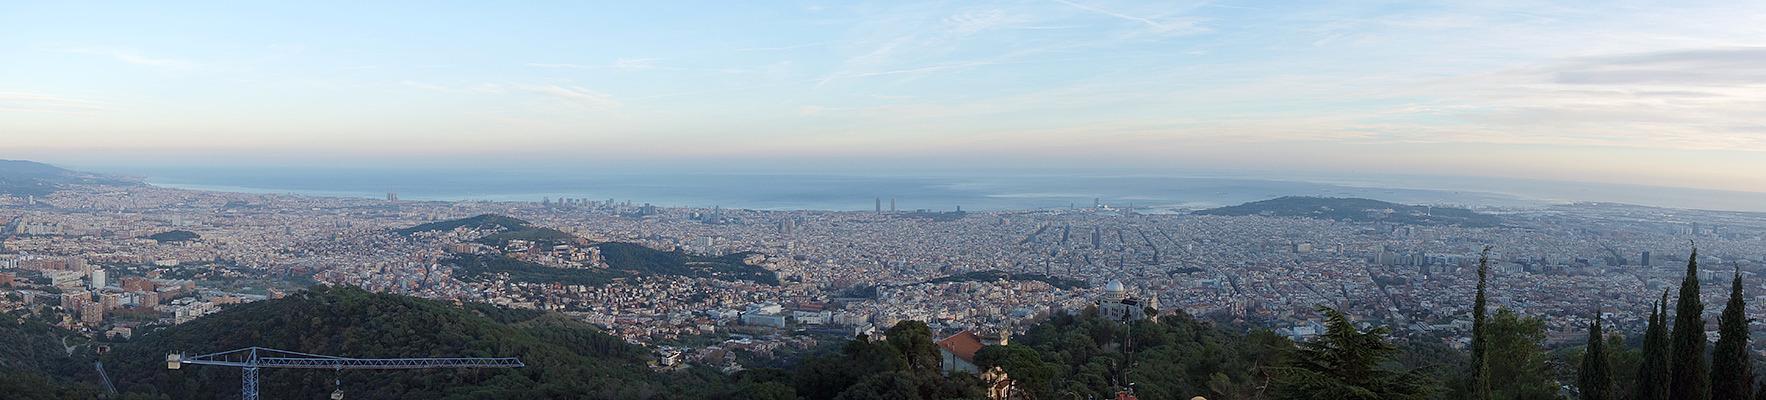 barcelona vom tibidabo (520 m) aus